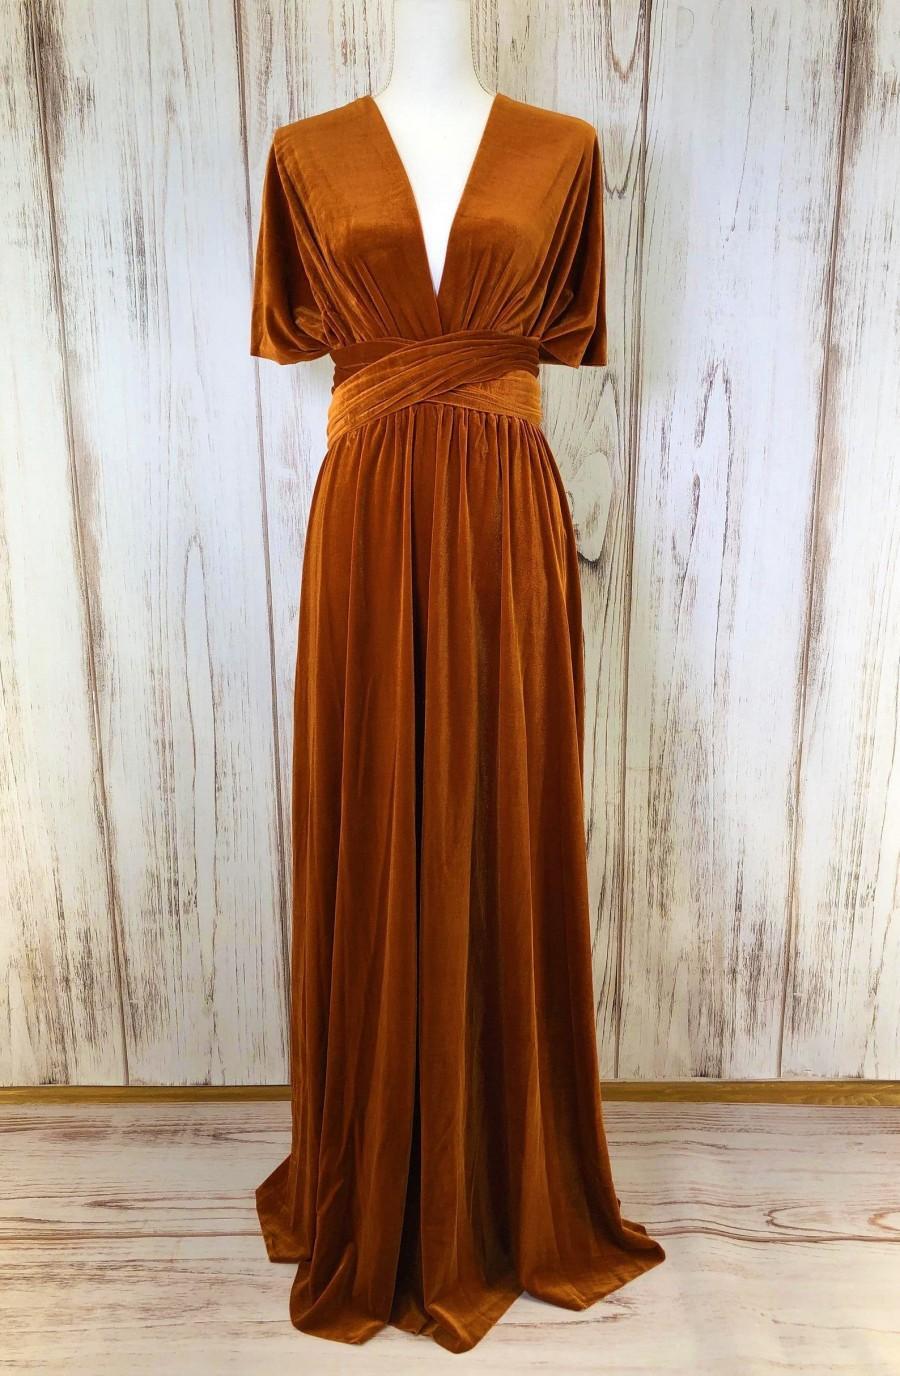 Hochzeit - BURNT ORANGE VELVET Infinity Dress/ Bridesmaids Dress/ Convertible Dress / Multiway Dress/ Multiway Wrap Dress / Velvet Bridesmaids Dress